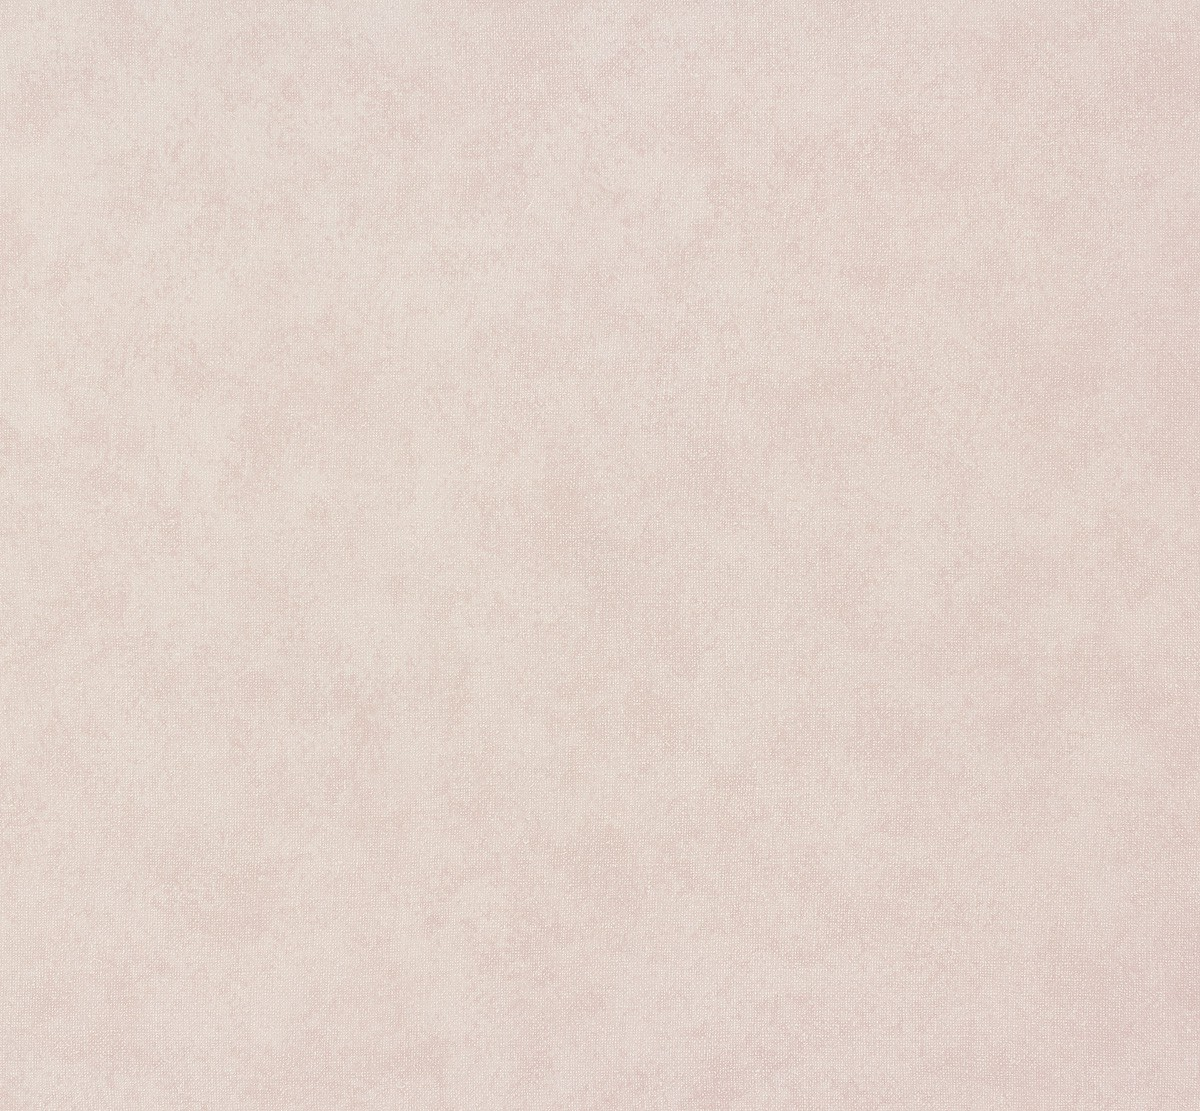 tapete elegance as creation uni rosa 30175 5. Black Bedroom Furniture Sets. Home Design Ideas